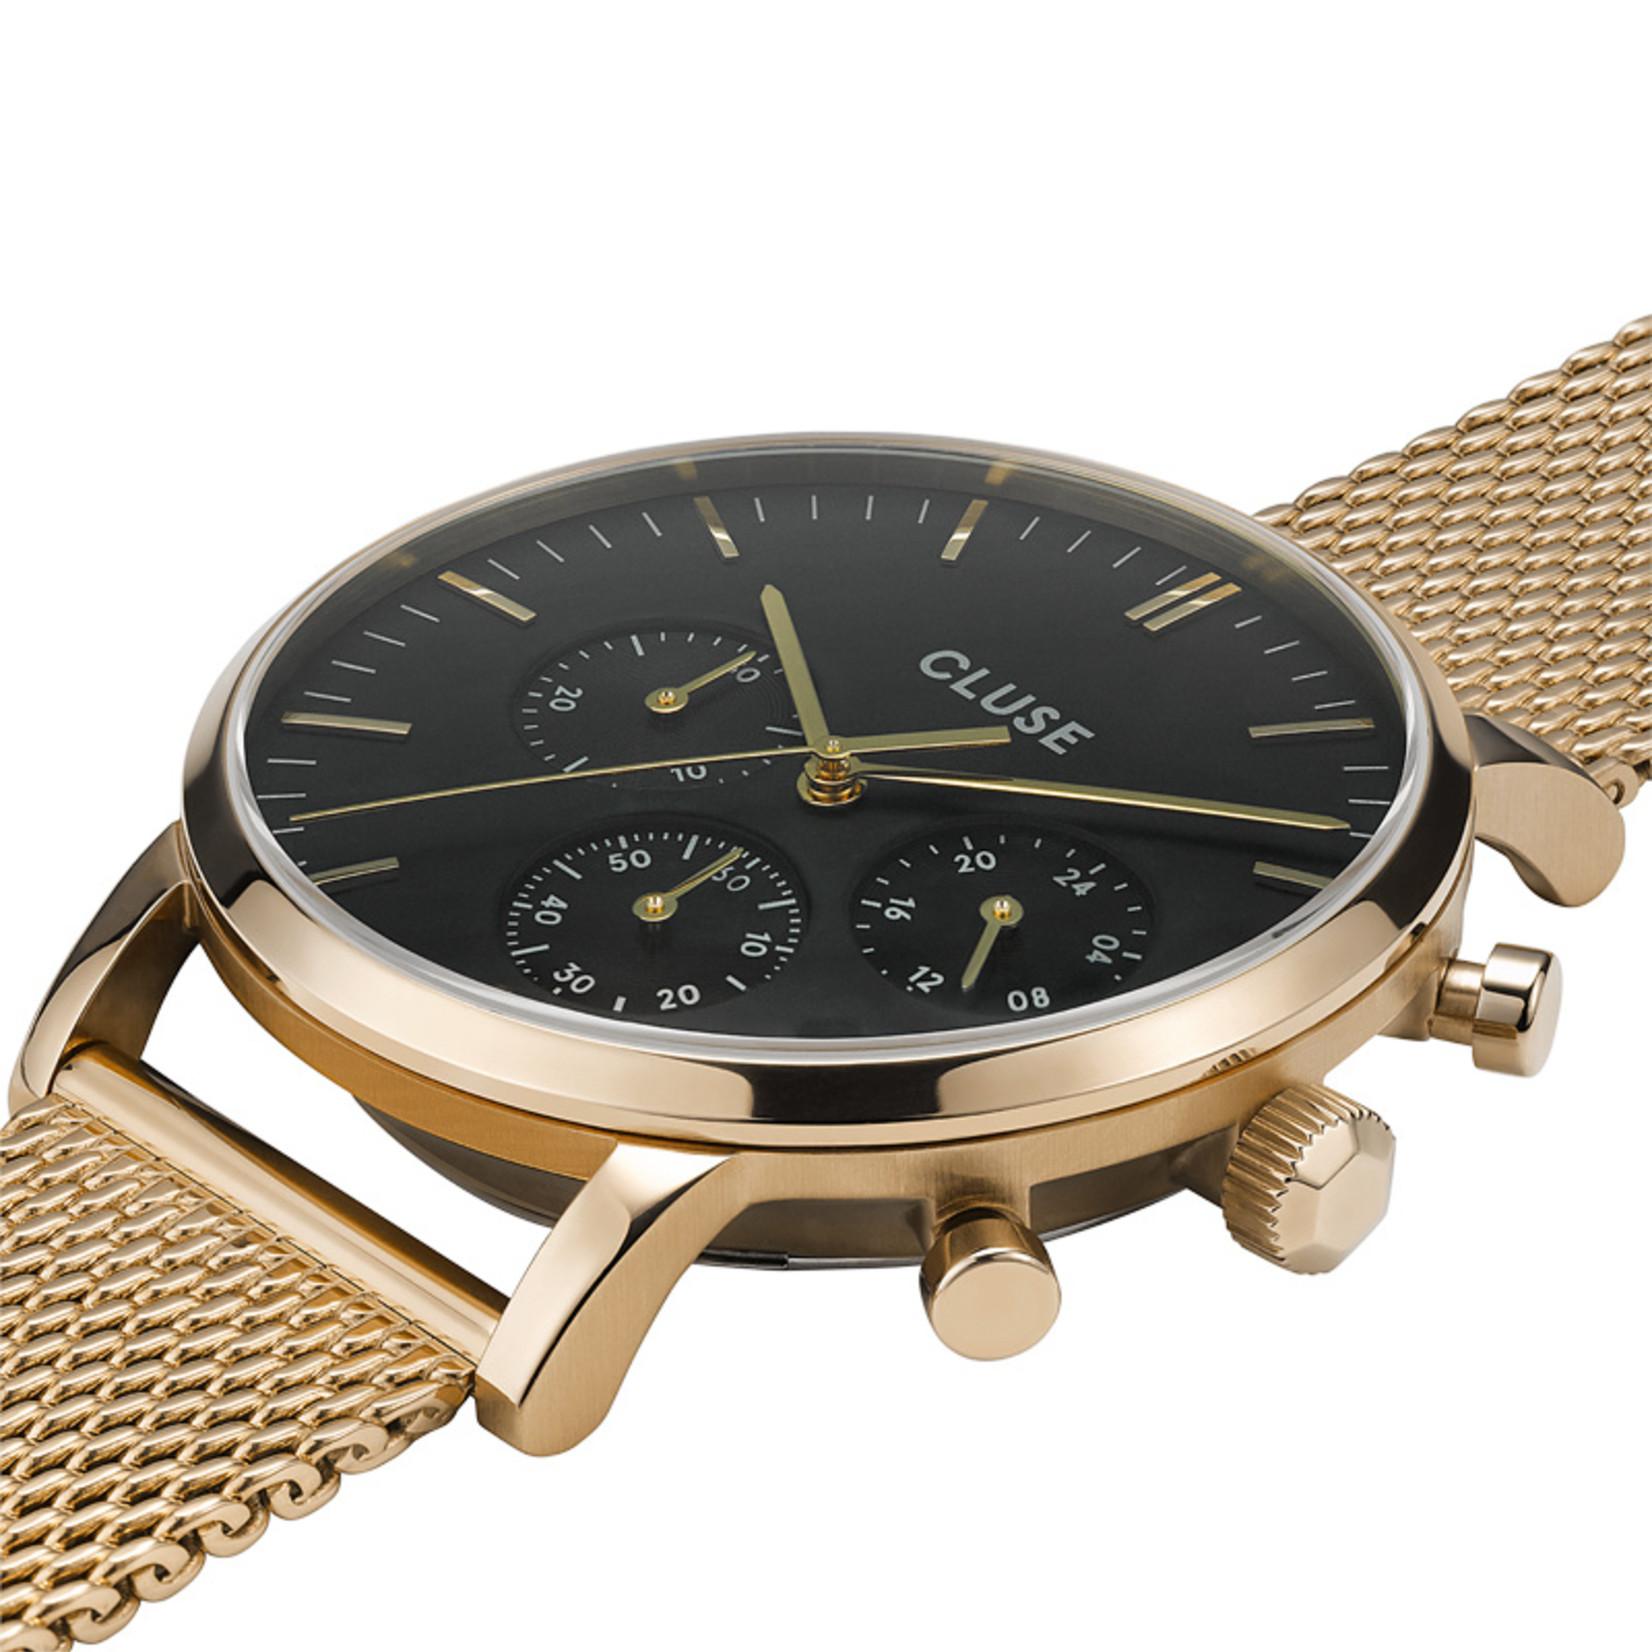 Cluse Cluse Uhr Aravis gold-schwarz I Chronograph I Mesh Edelstahl